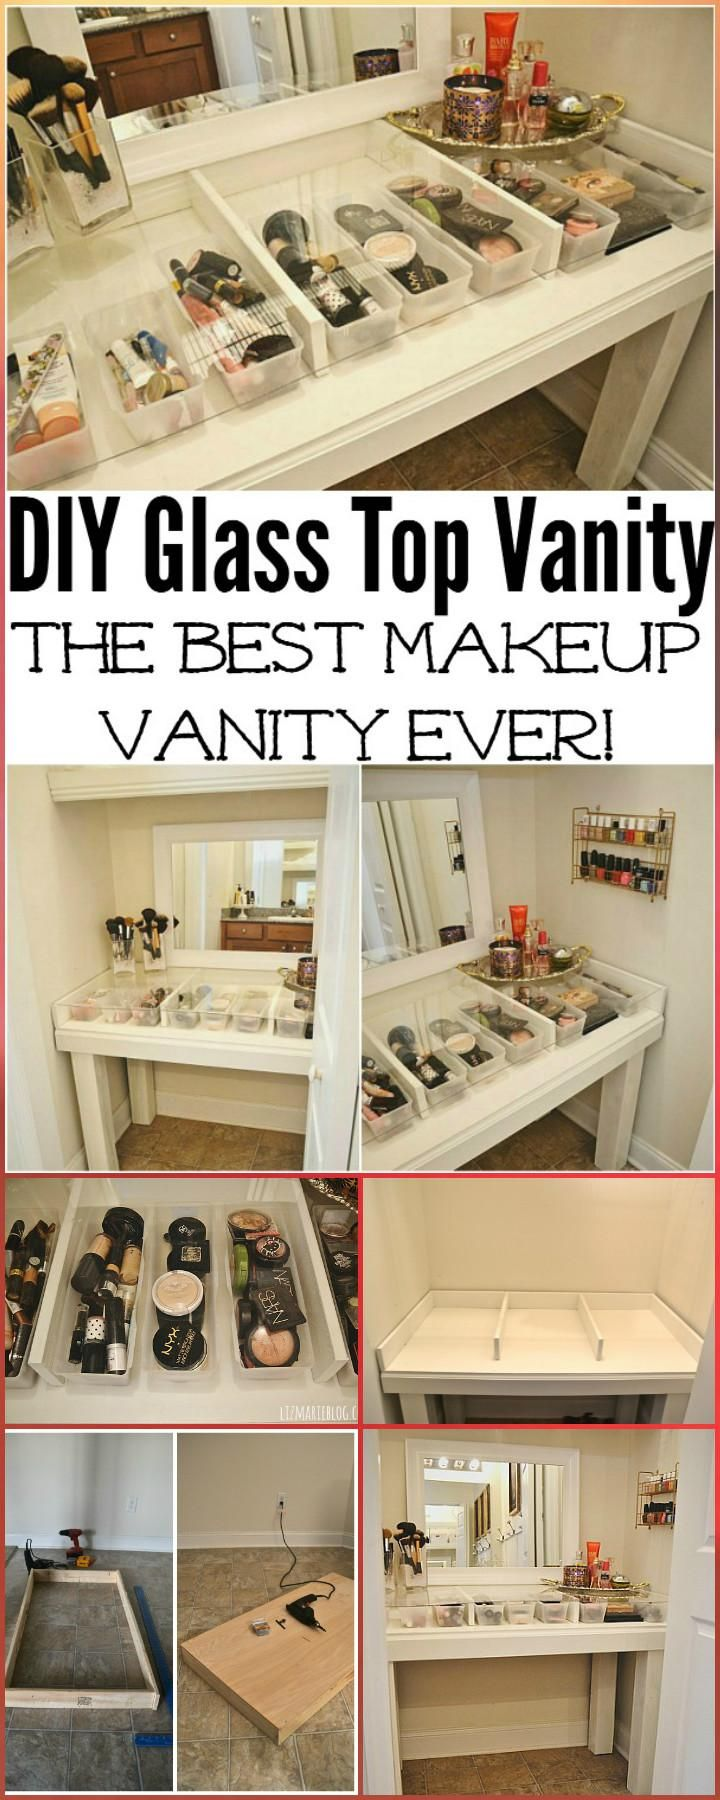 20+ DIY Makeup Vanity Tutorials – Make Your own DIY Vanity images